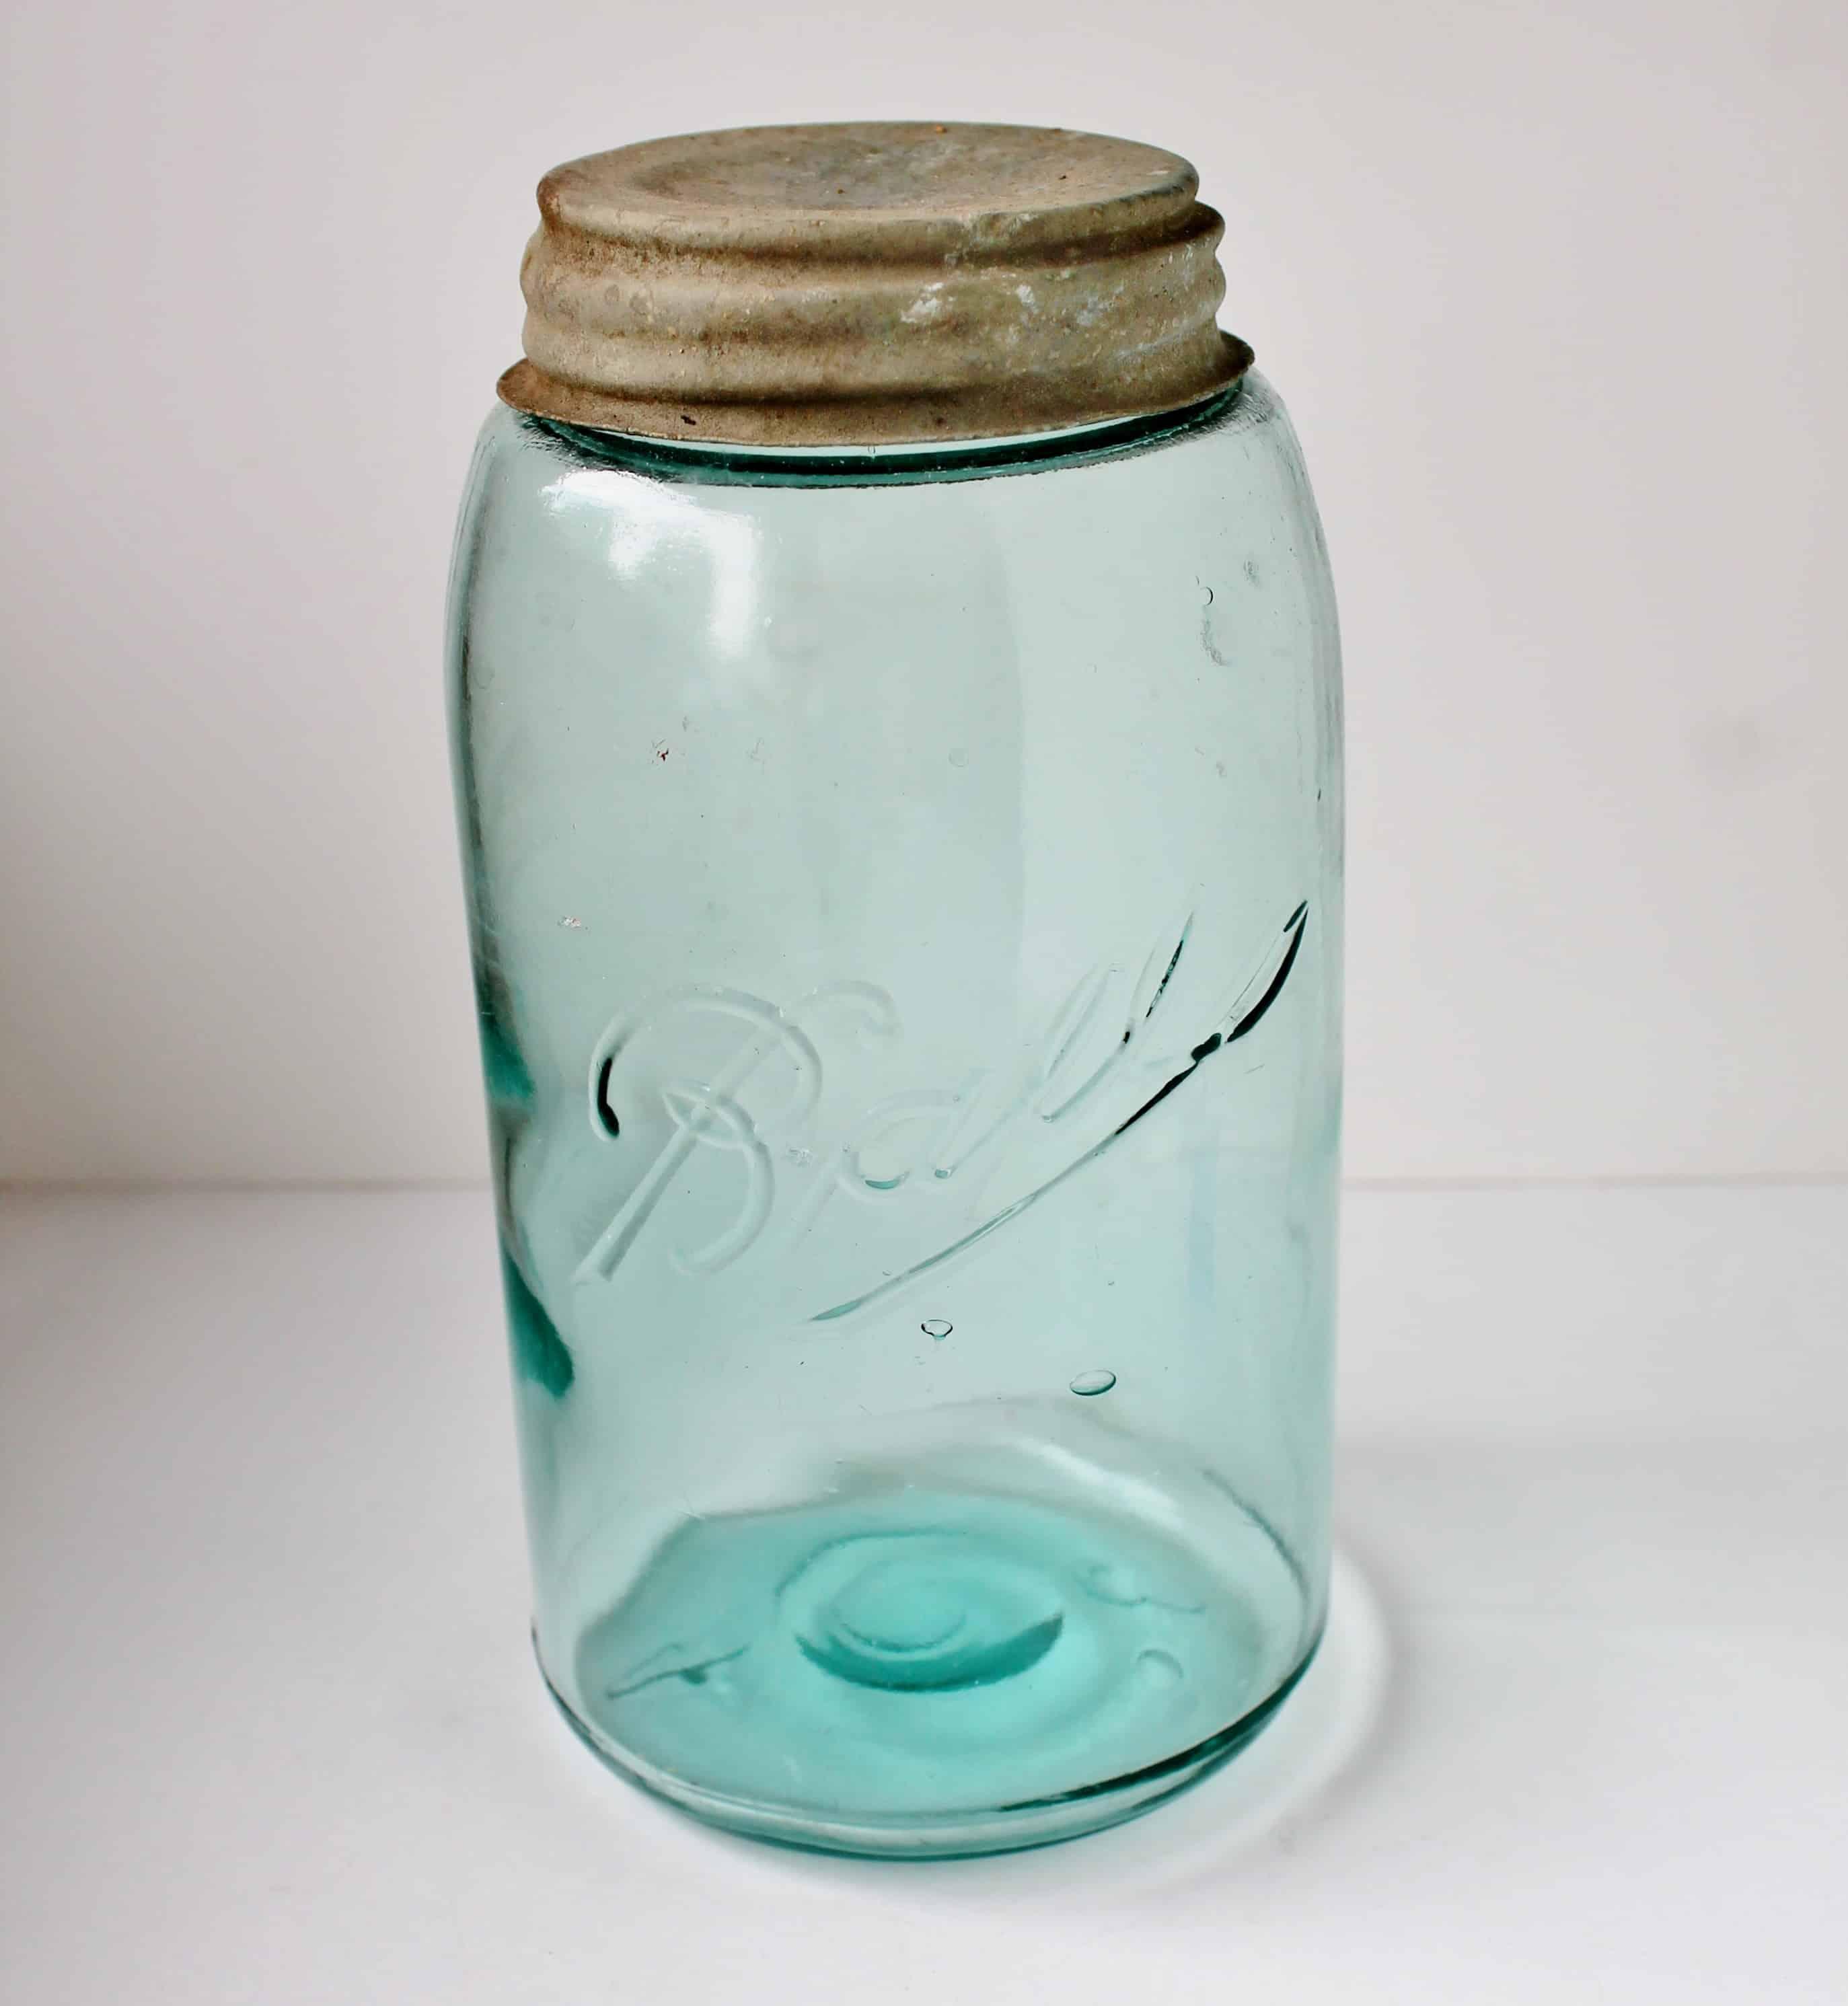 dating vintage ball canning jars